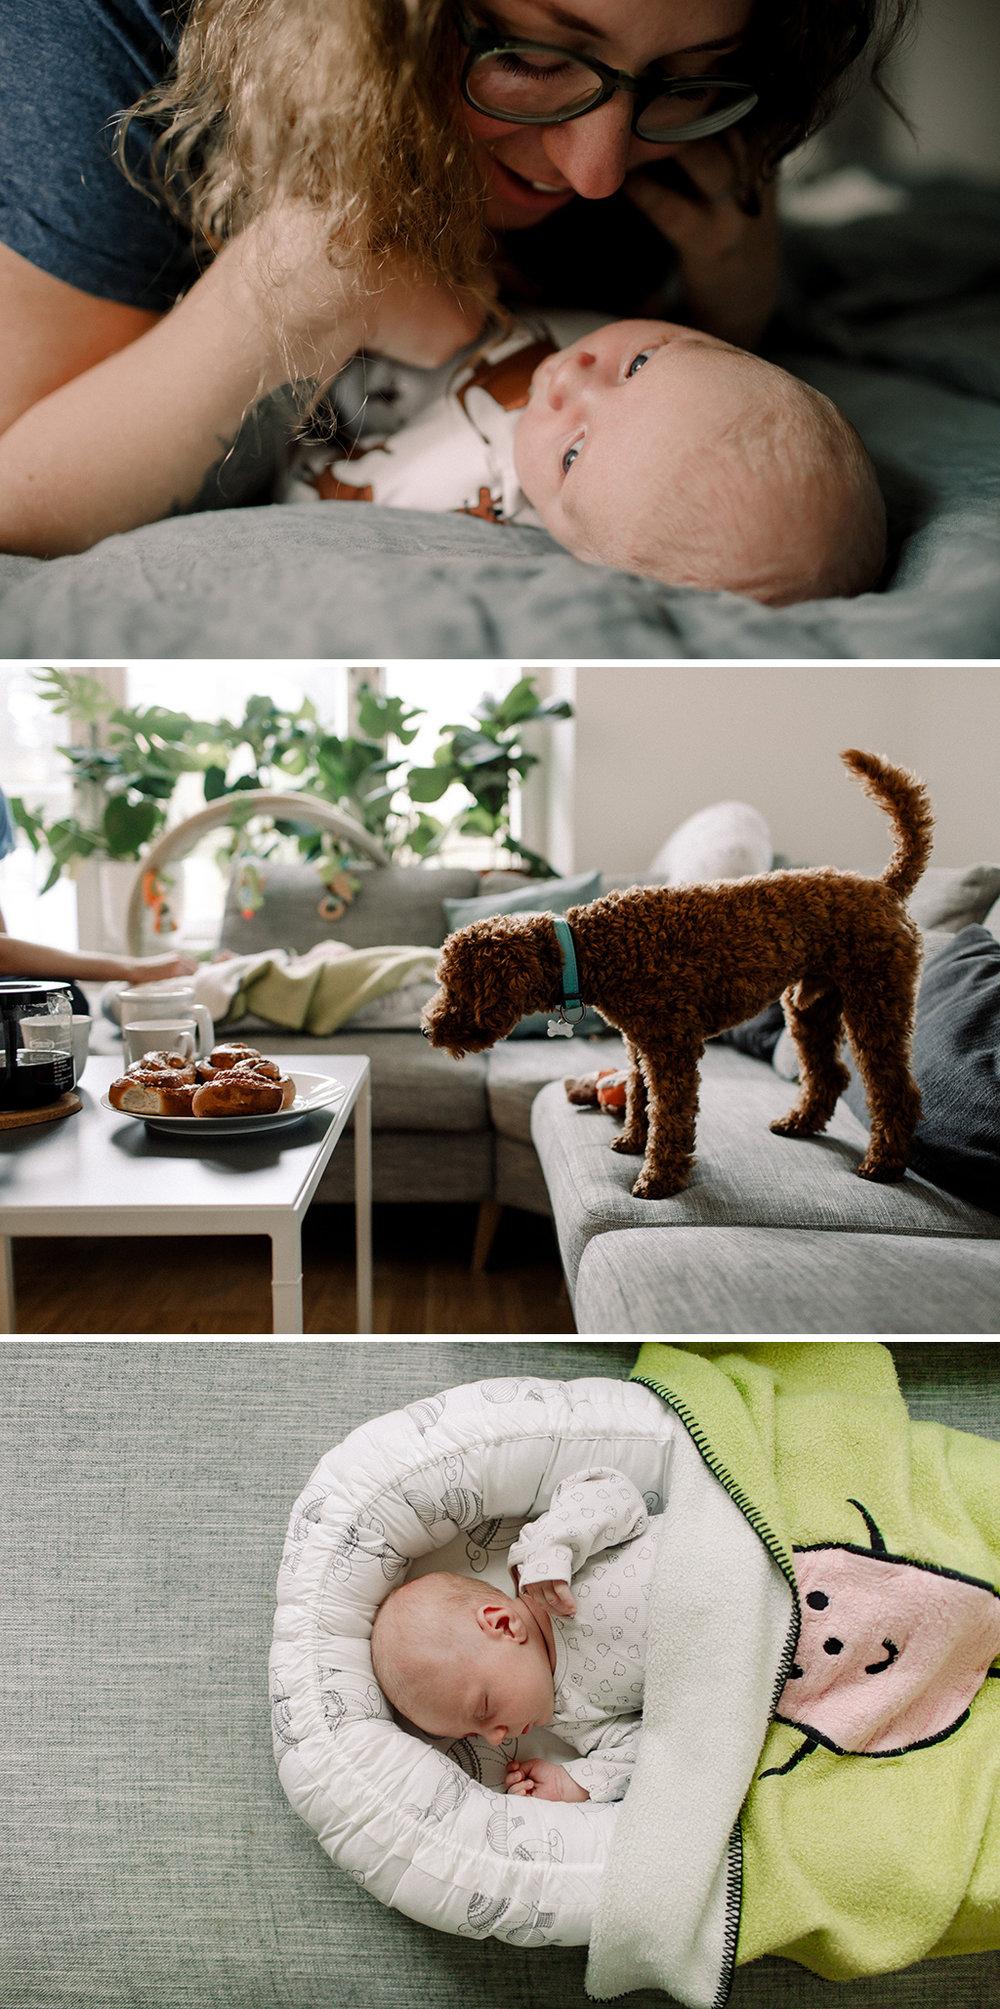 Newborn_Nyfoddfotografering_Stockholm_Familjefotograf_7.jpg